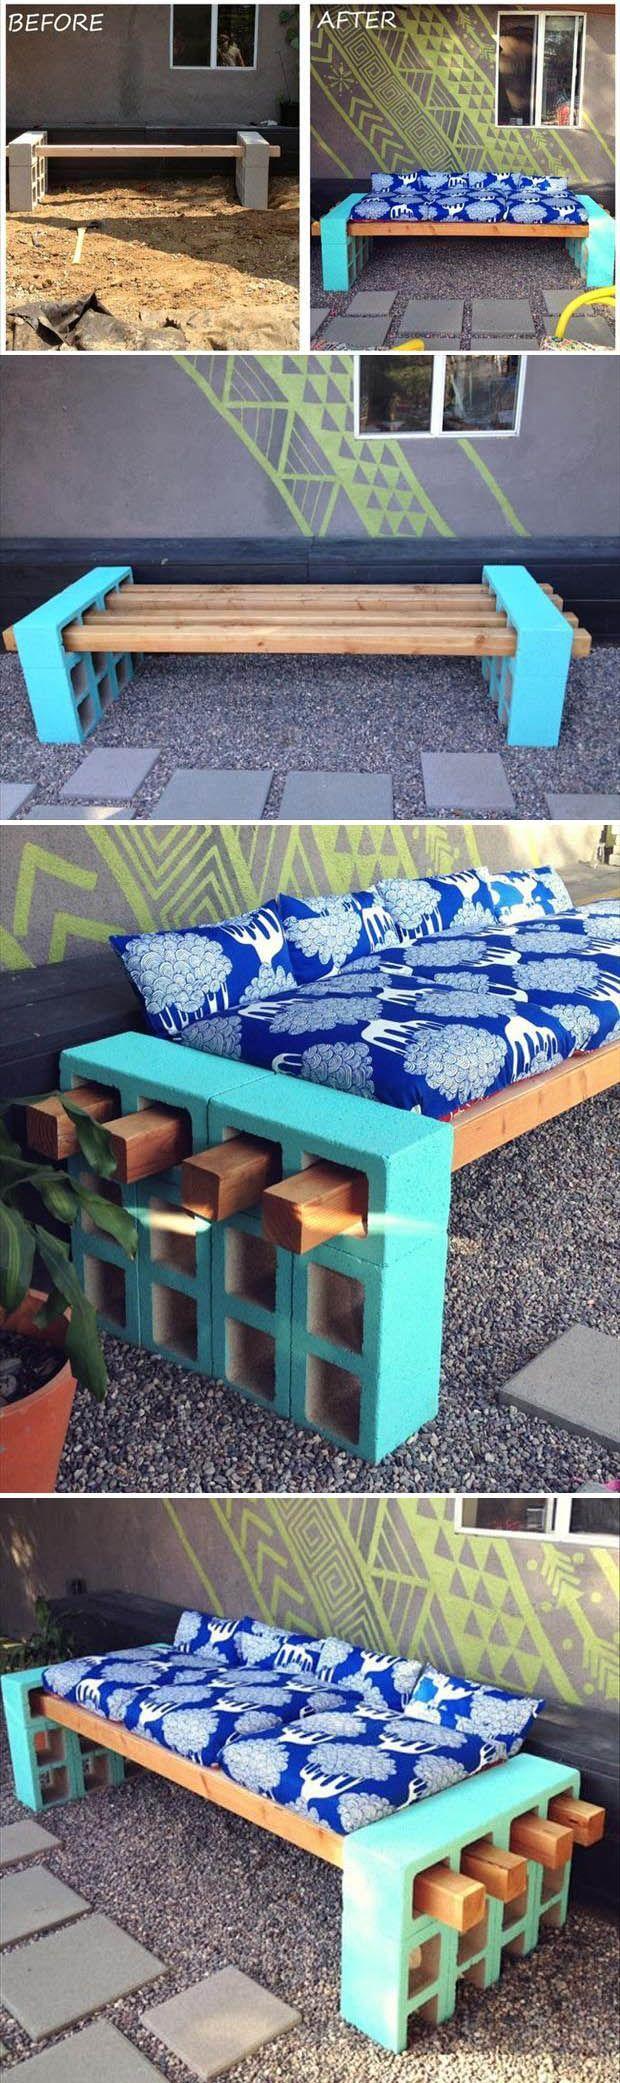 Fun Do It Yourself Craft Ideas Pin ItSources – WhereHomeStarts - GeekFill – PrincessPinkyGirl – Lenasekine.Blogsp... DIY Outdoor Decor #diy #homedecor #outdoorentertaining